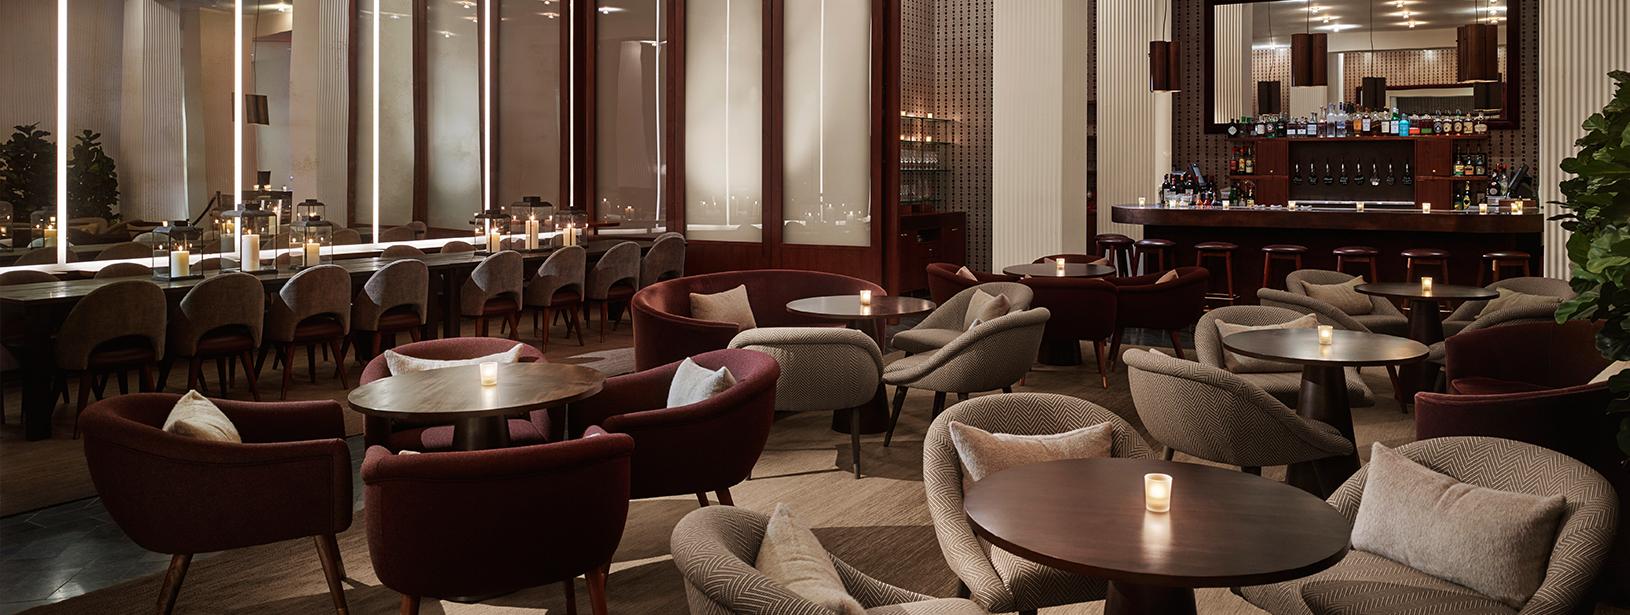 Best Hotel Bars Nyc The Redbury New York